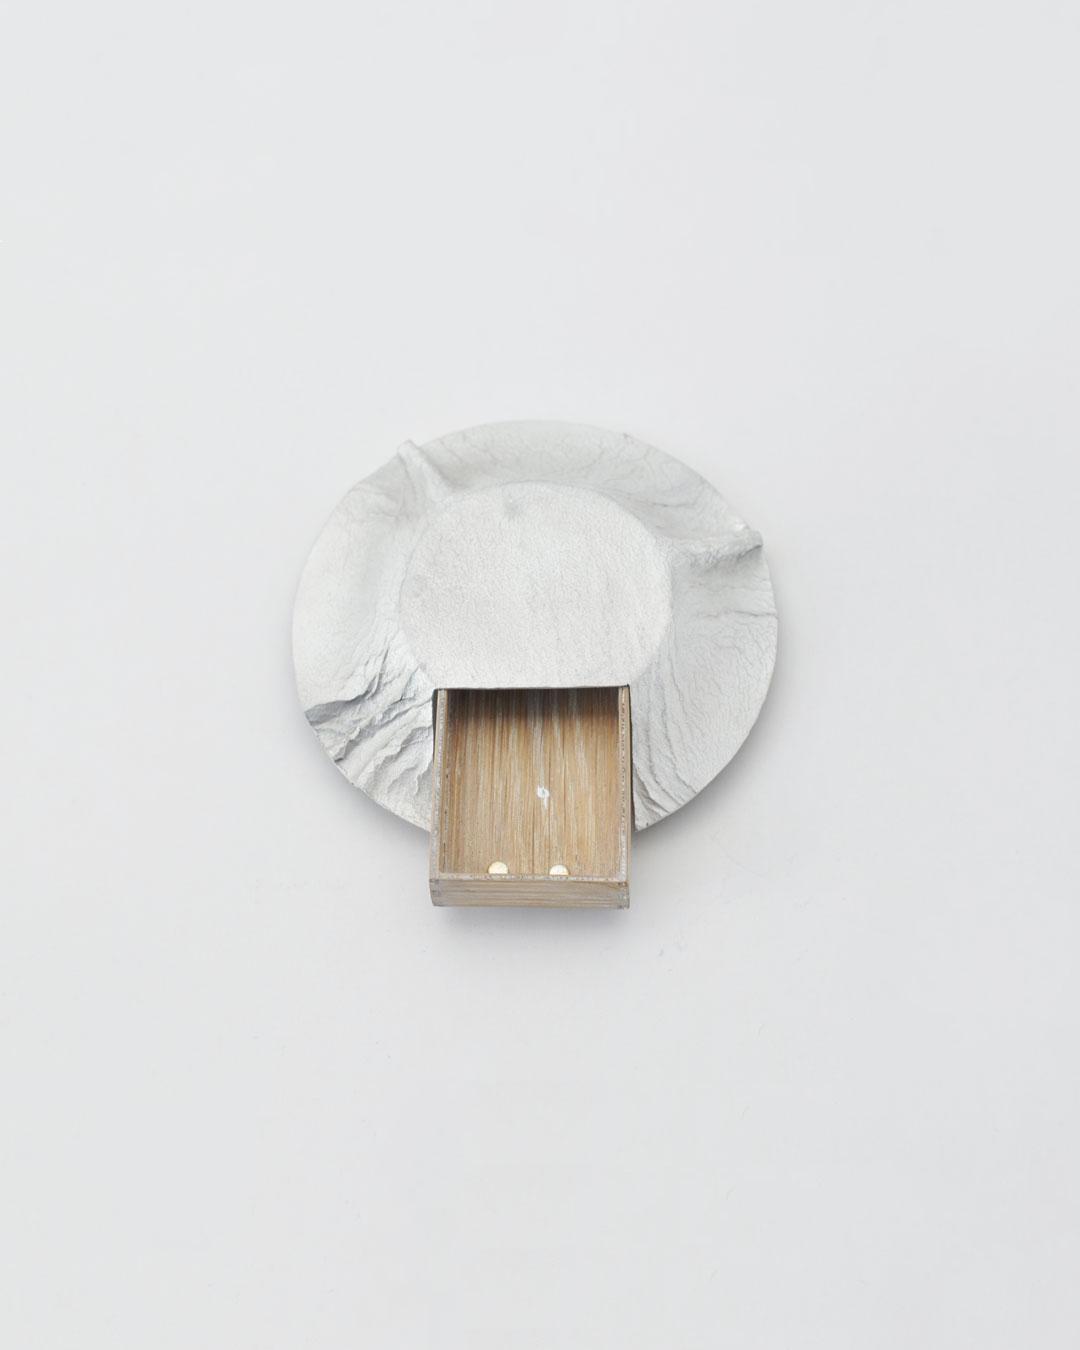 Anders Ljungberg, Declaration #3, 2019, brooch; aluminium, laminated oak, steel, silver, 110 x 100 x 21 mm, €920